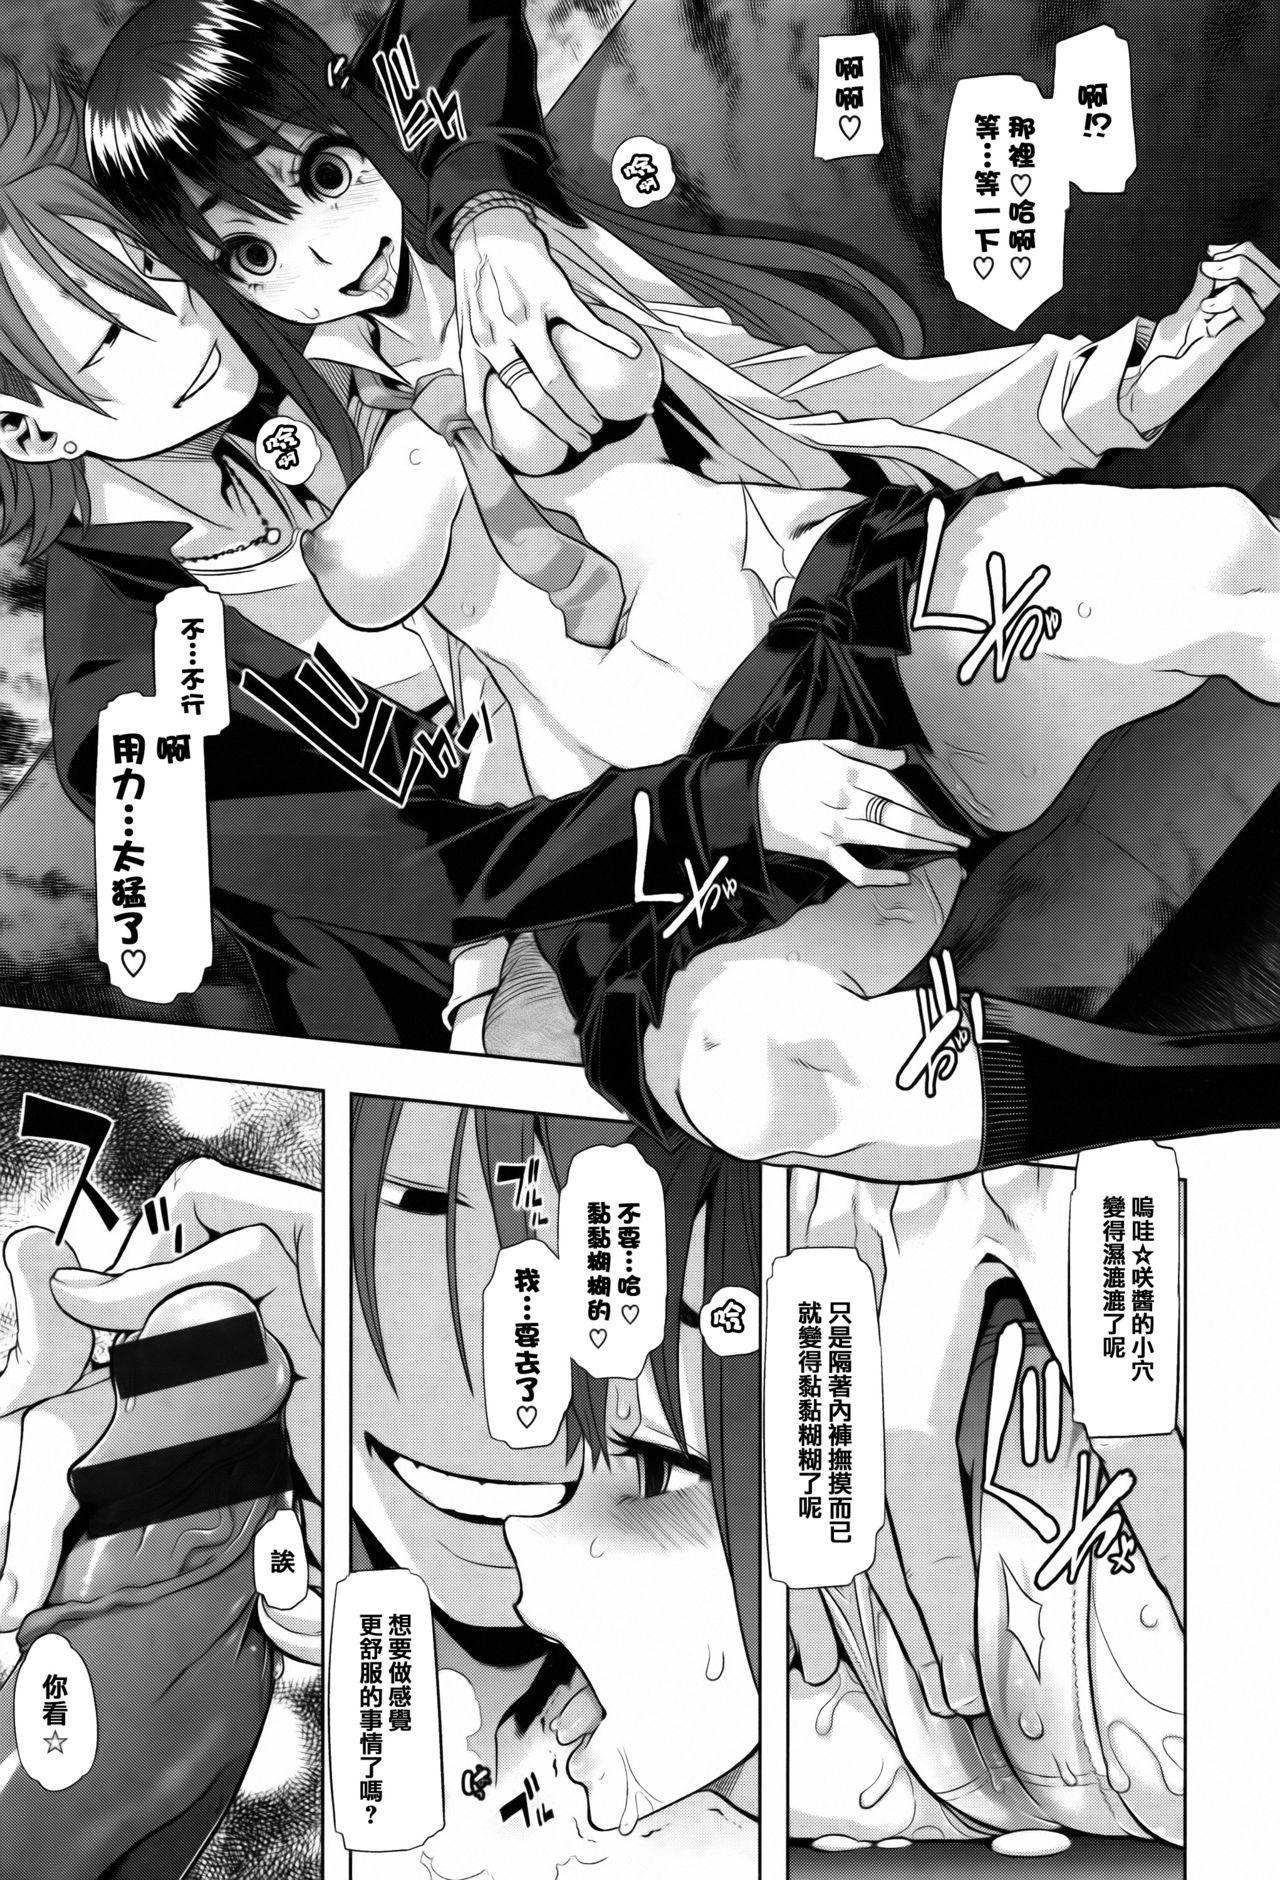 Henshin + 4P leaflet 18